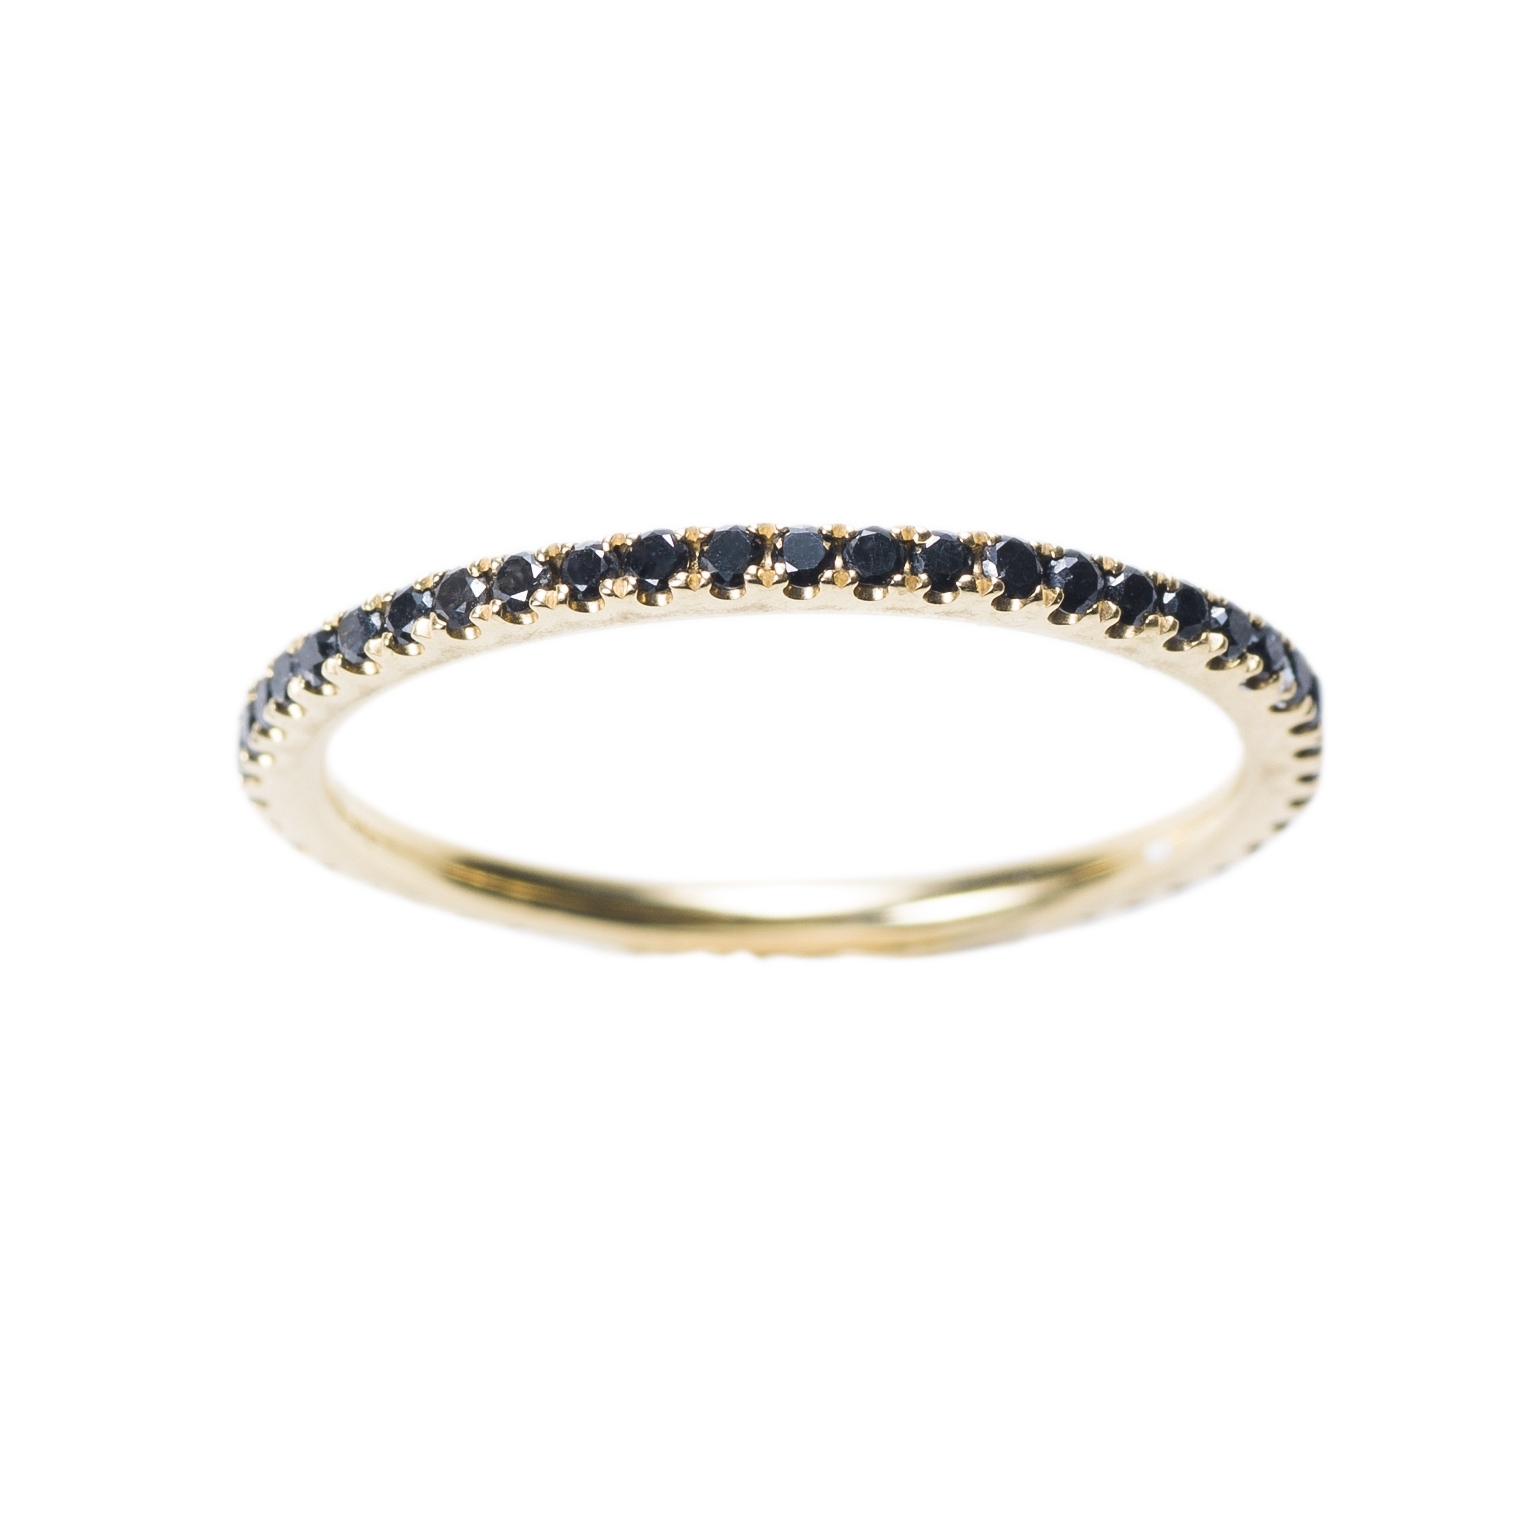 PETIT OLIVIA RING  17.500 NOK. 18 kt gold with black diamonds